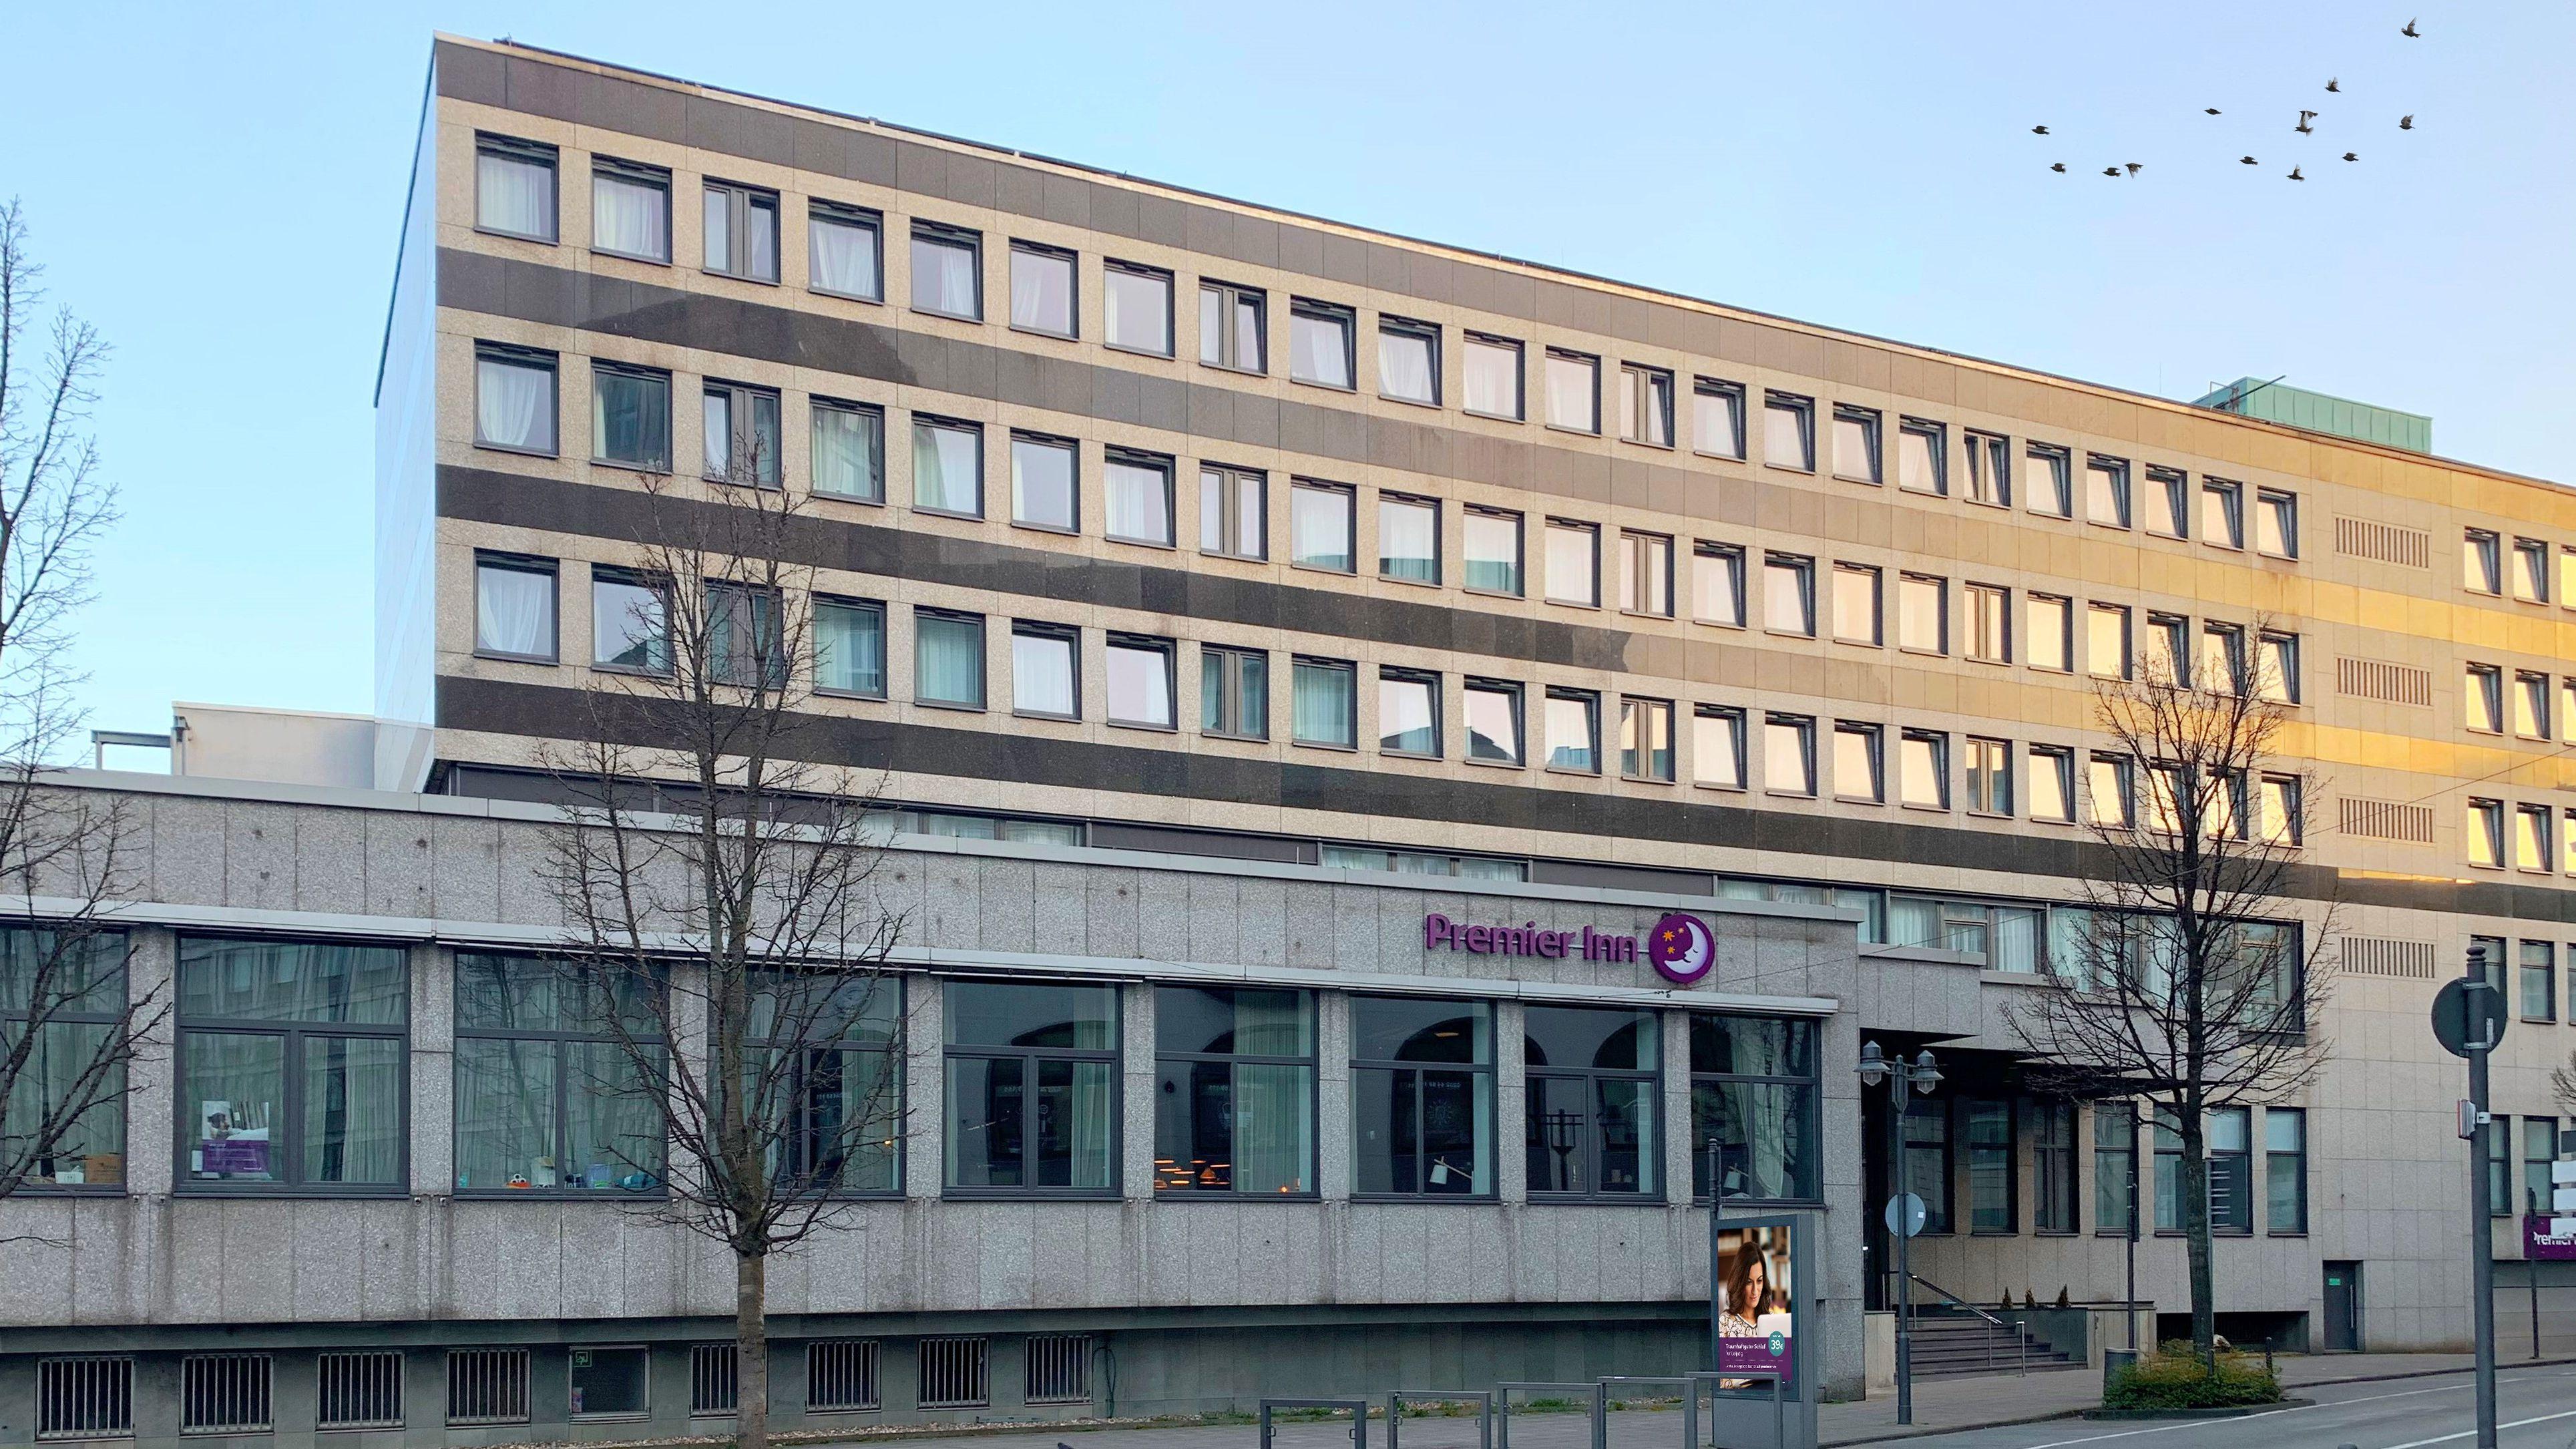 Expansion-Premier-Inn-startet-in-Wuppertal-im-fr-heren-NinetyNine-Hotel